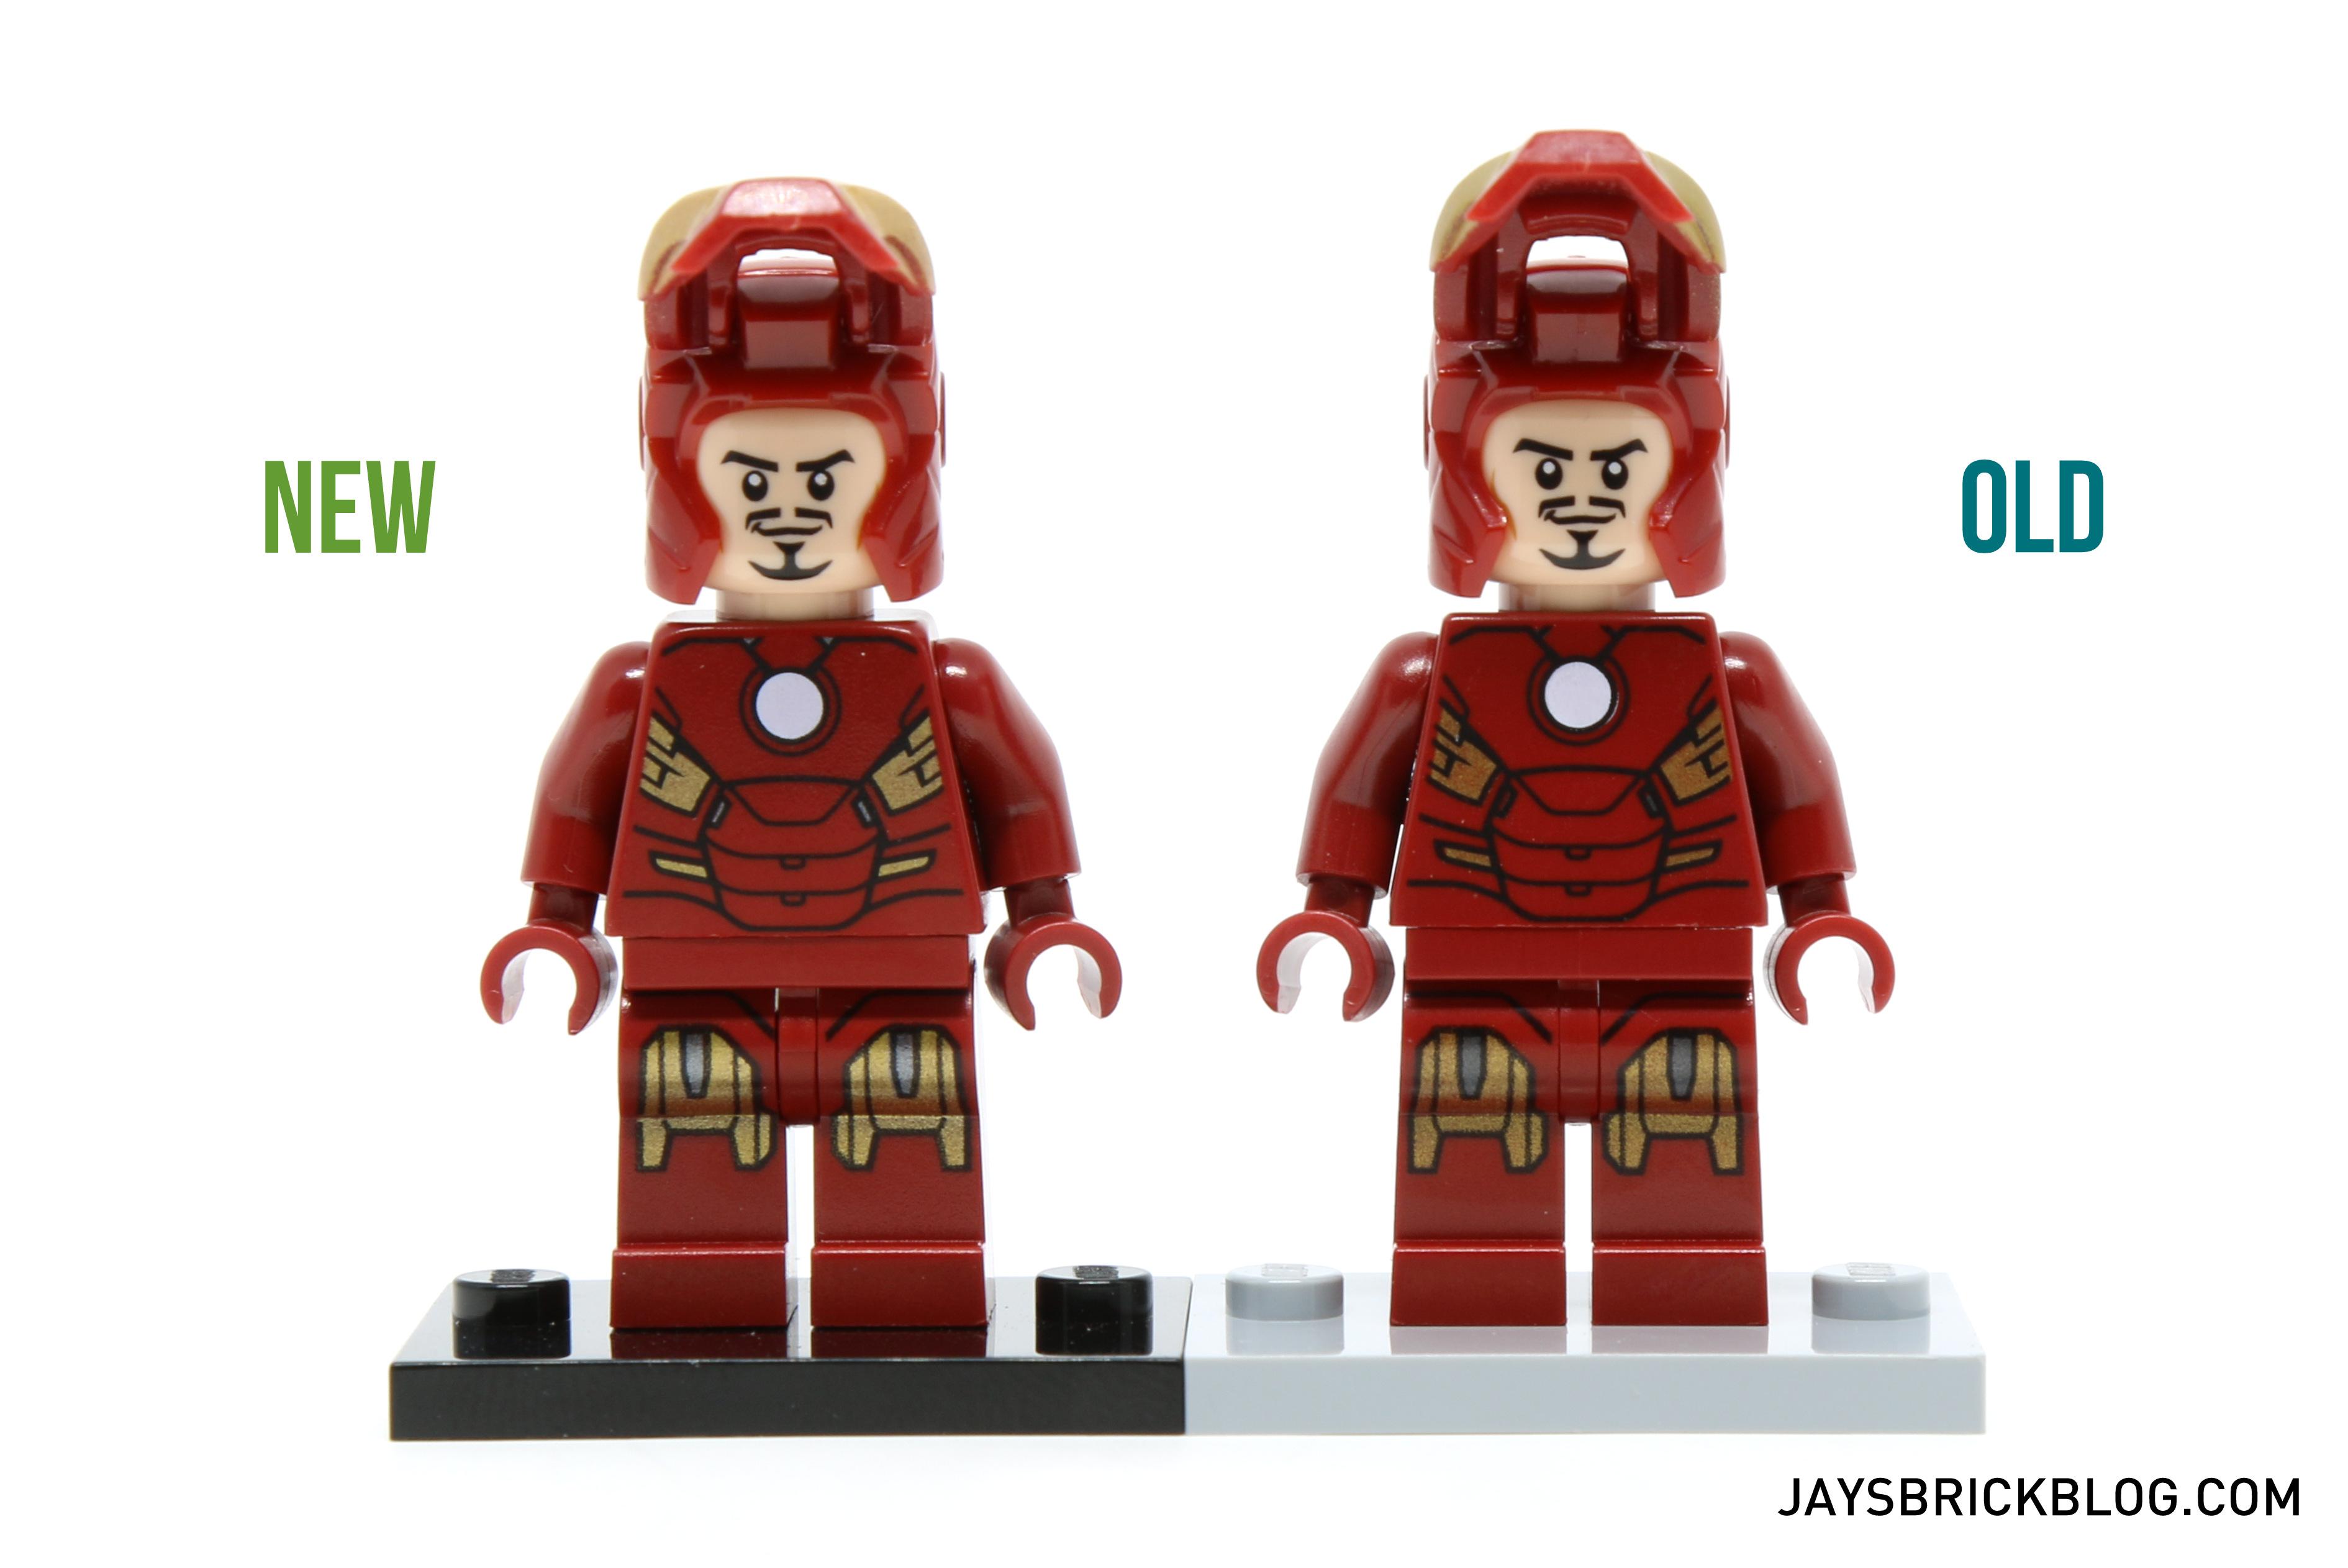 Iron Man 6869 and 10721 Minifigure Comparison - Tony Stark Face